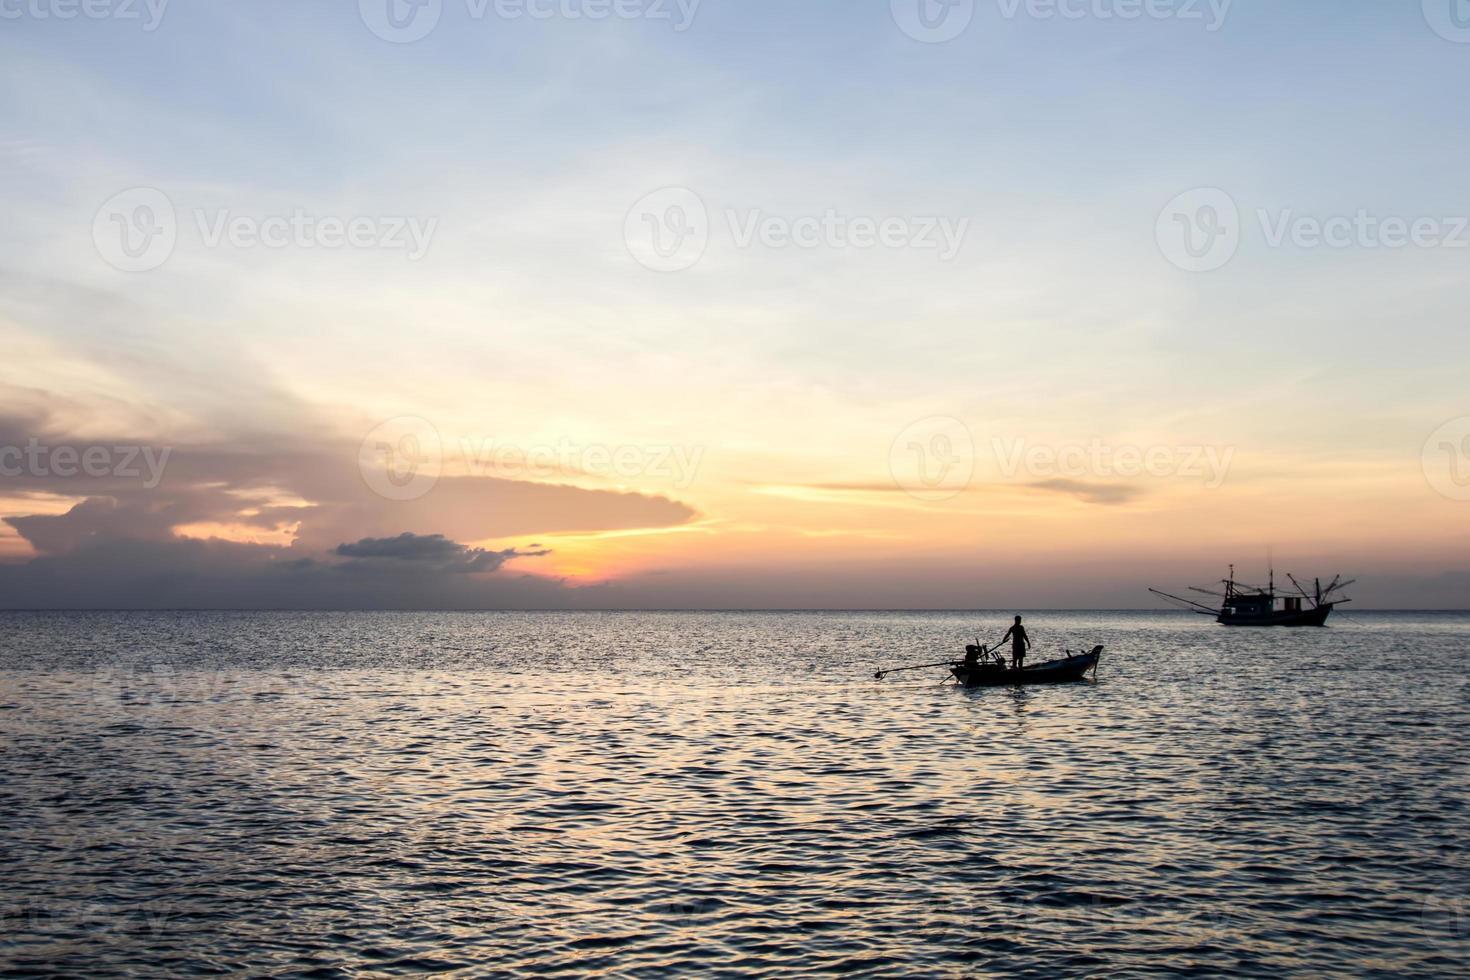 barco de cauda longa e pôr do sol no mar, koh phangan, surat thani foto